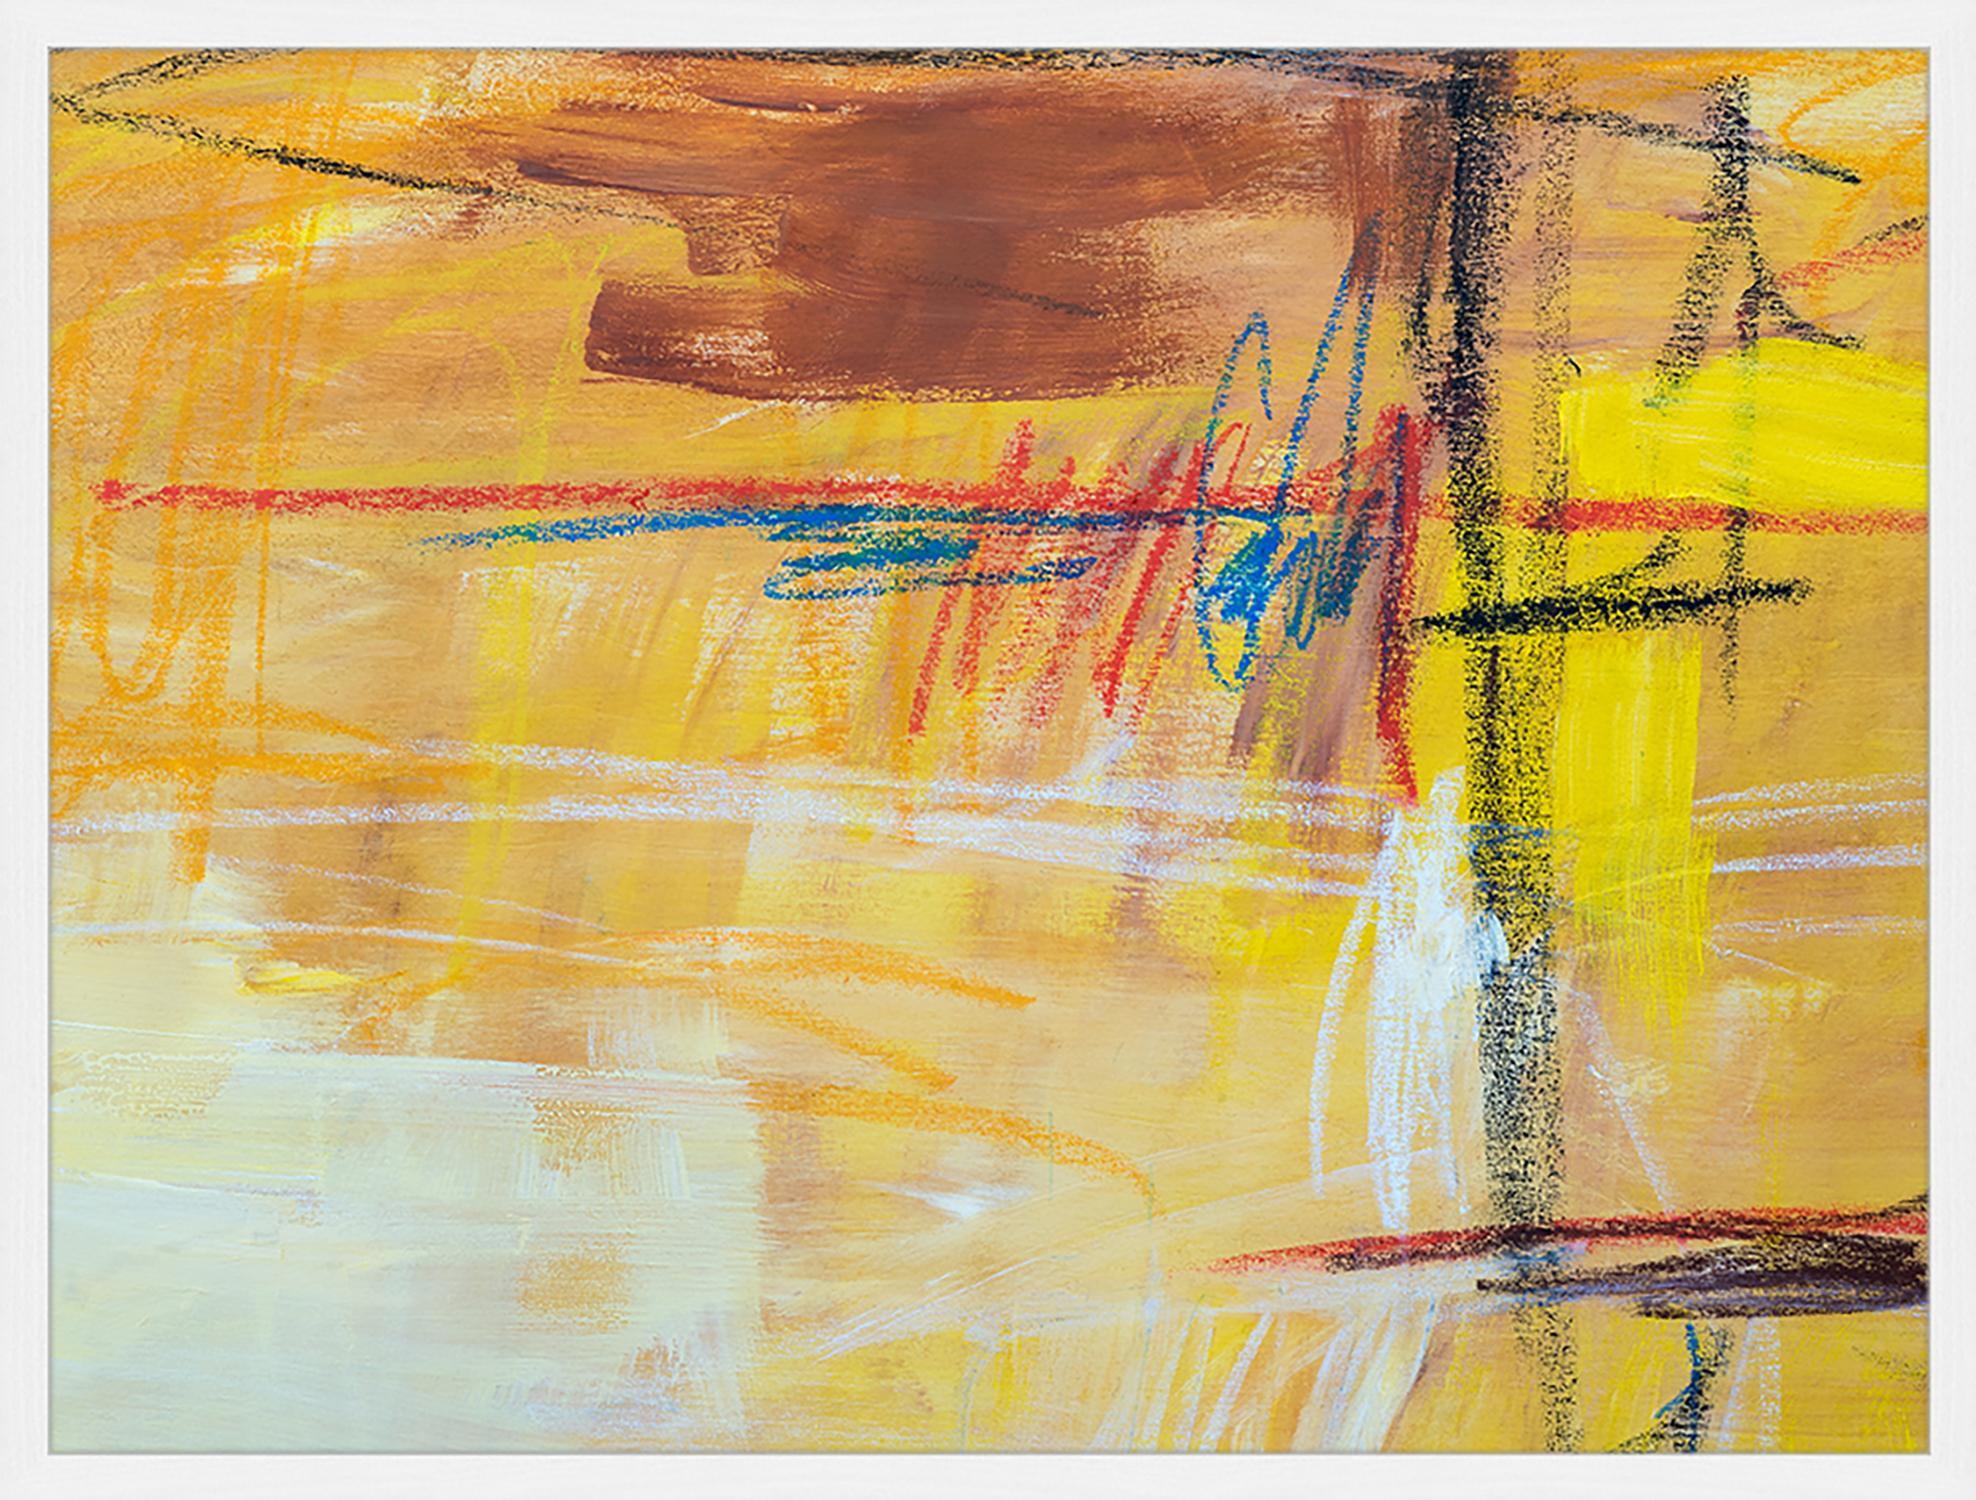 Gerahmter Digitaldruck Abstract Art IV, Bild: Digitaldruck auf Papier, , Rahmen: Holz, lackiert, Front: Plexiglas, Mehrfarbig, 83 x 63 cm